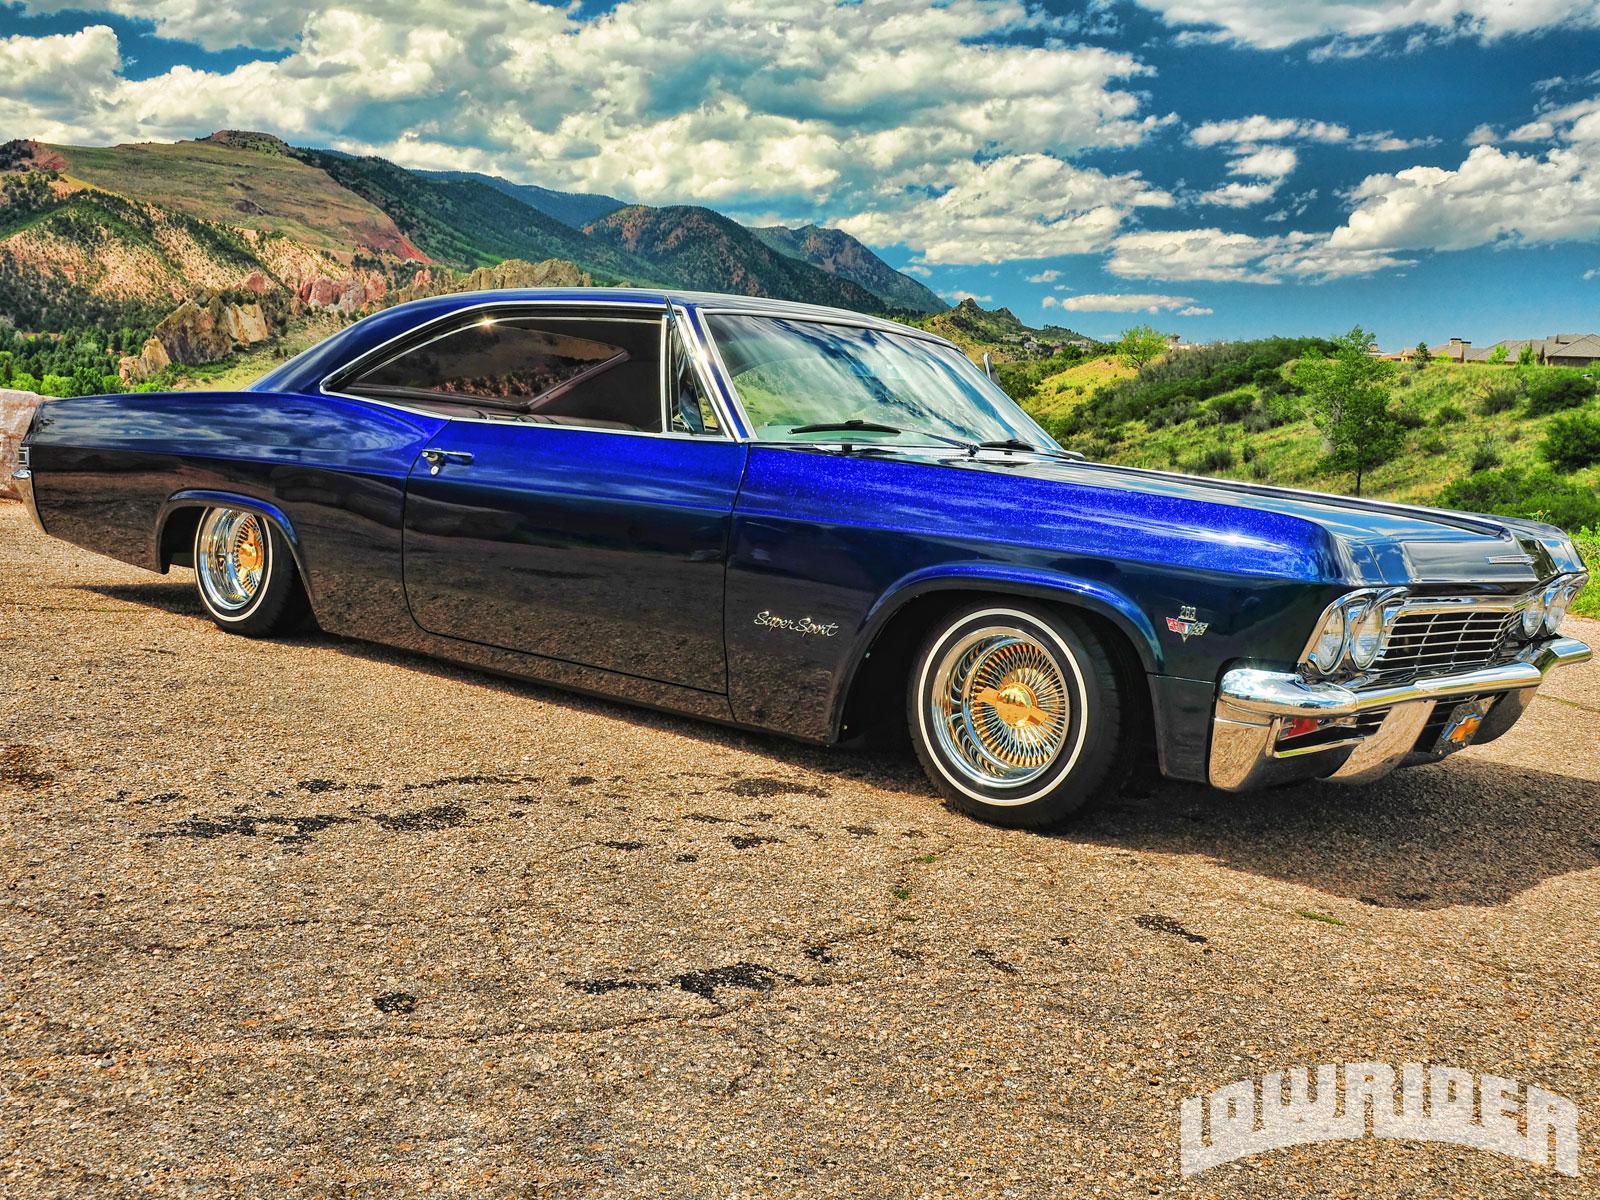 1965 Chevrolet Impala SS - Lowrider Magazine